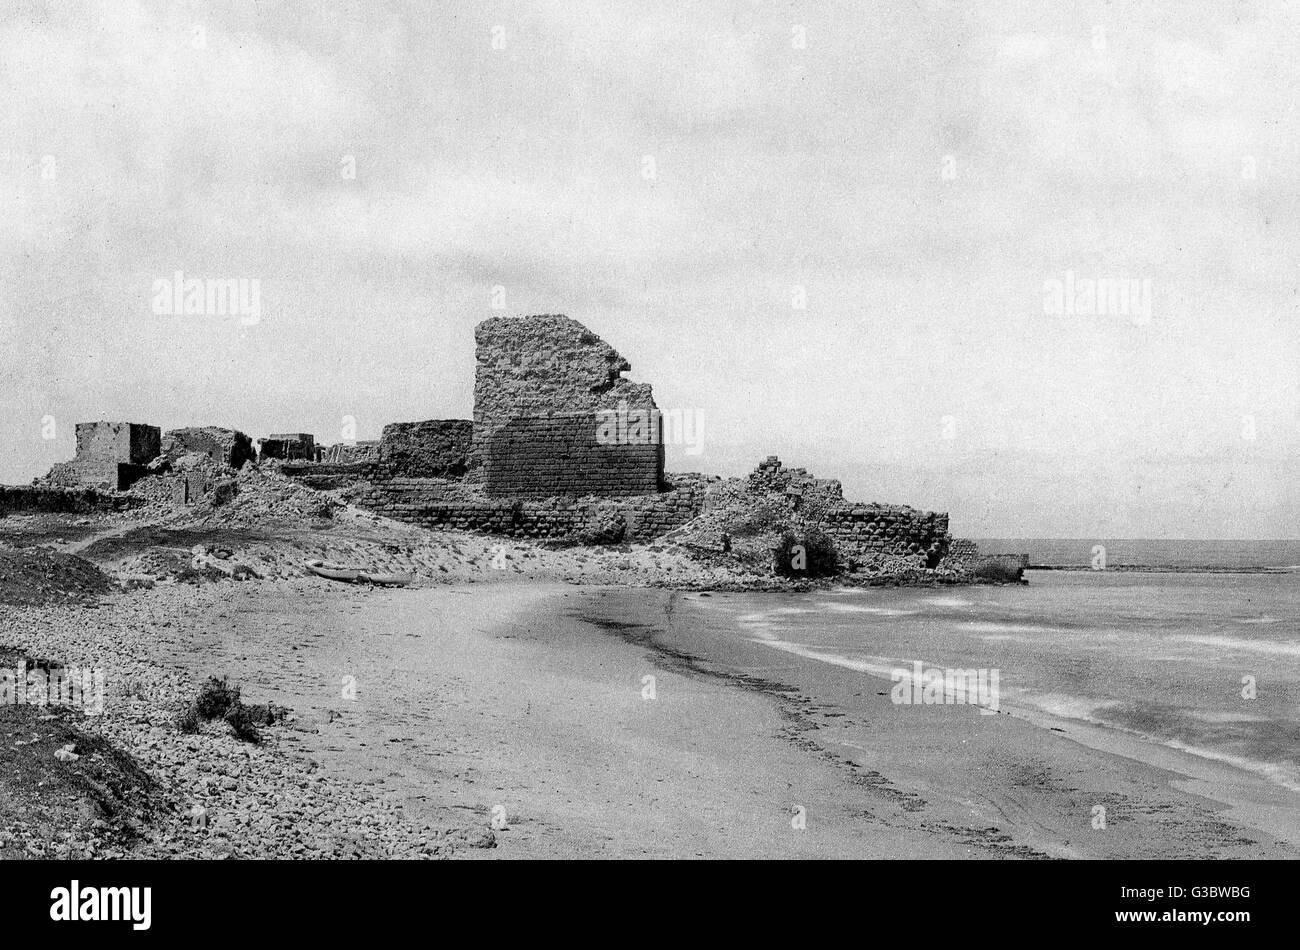 Ruined crusader fort at Atlit, near Haifa, Galilee, Northern Israel.      Date: 1920s - Stock Image